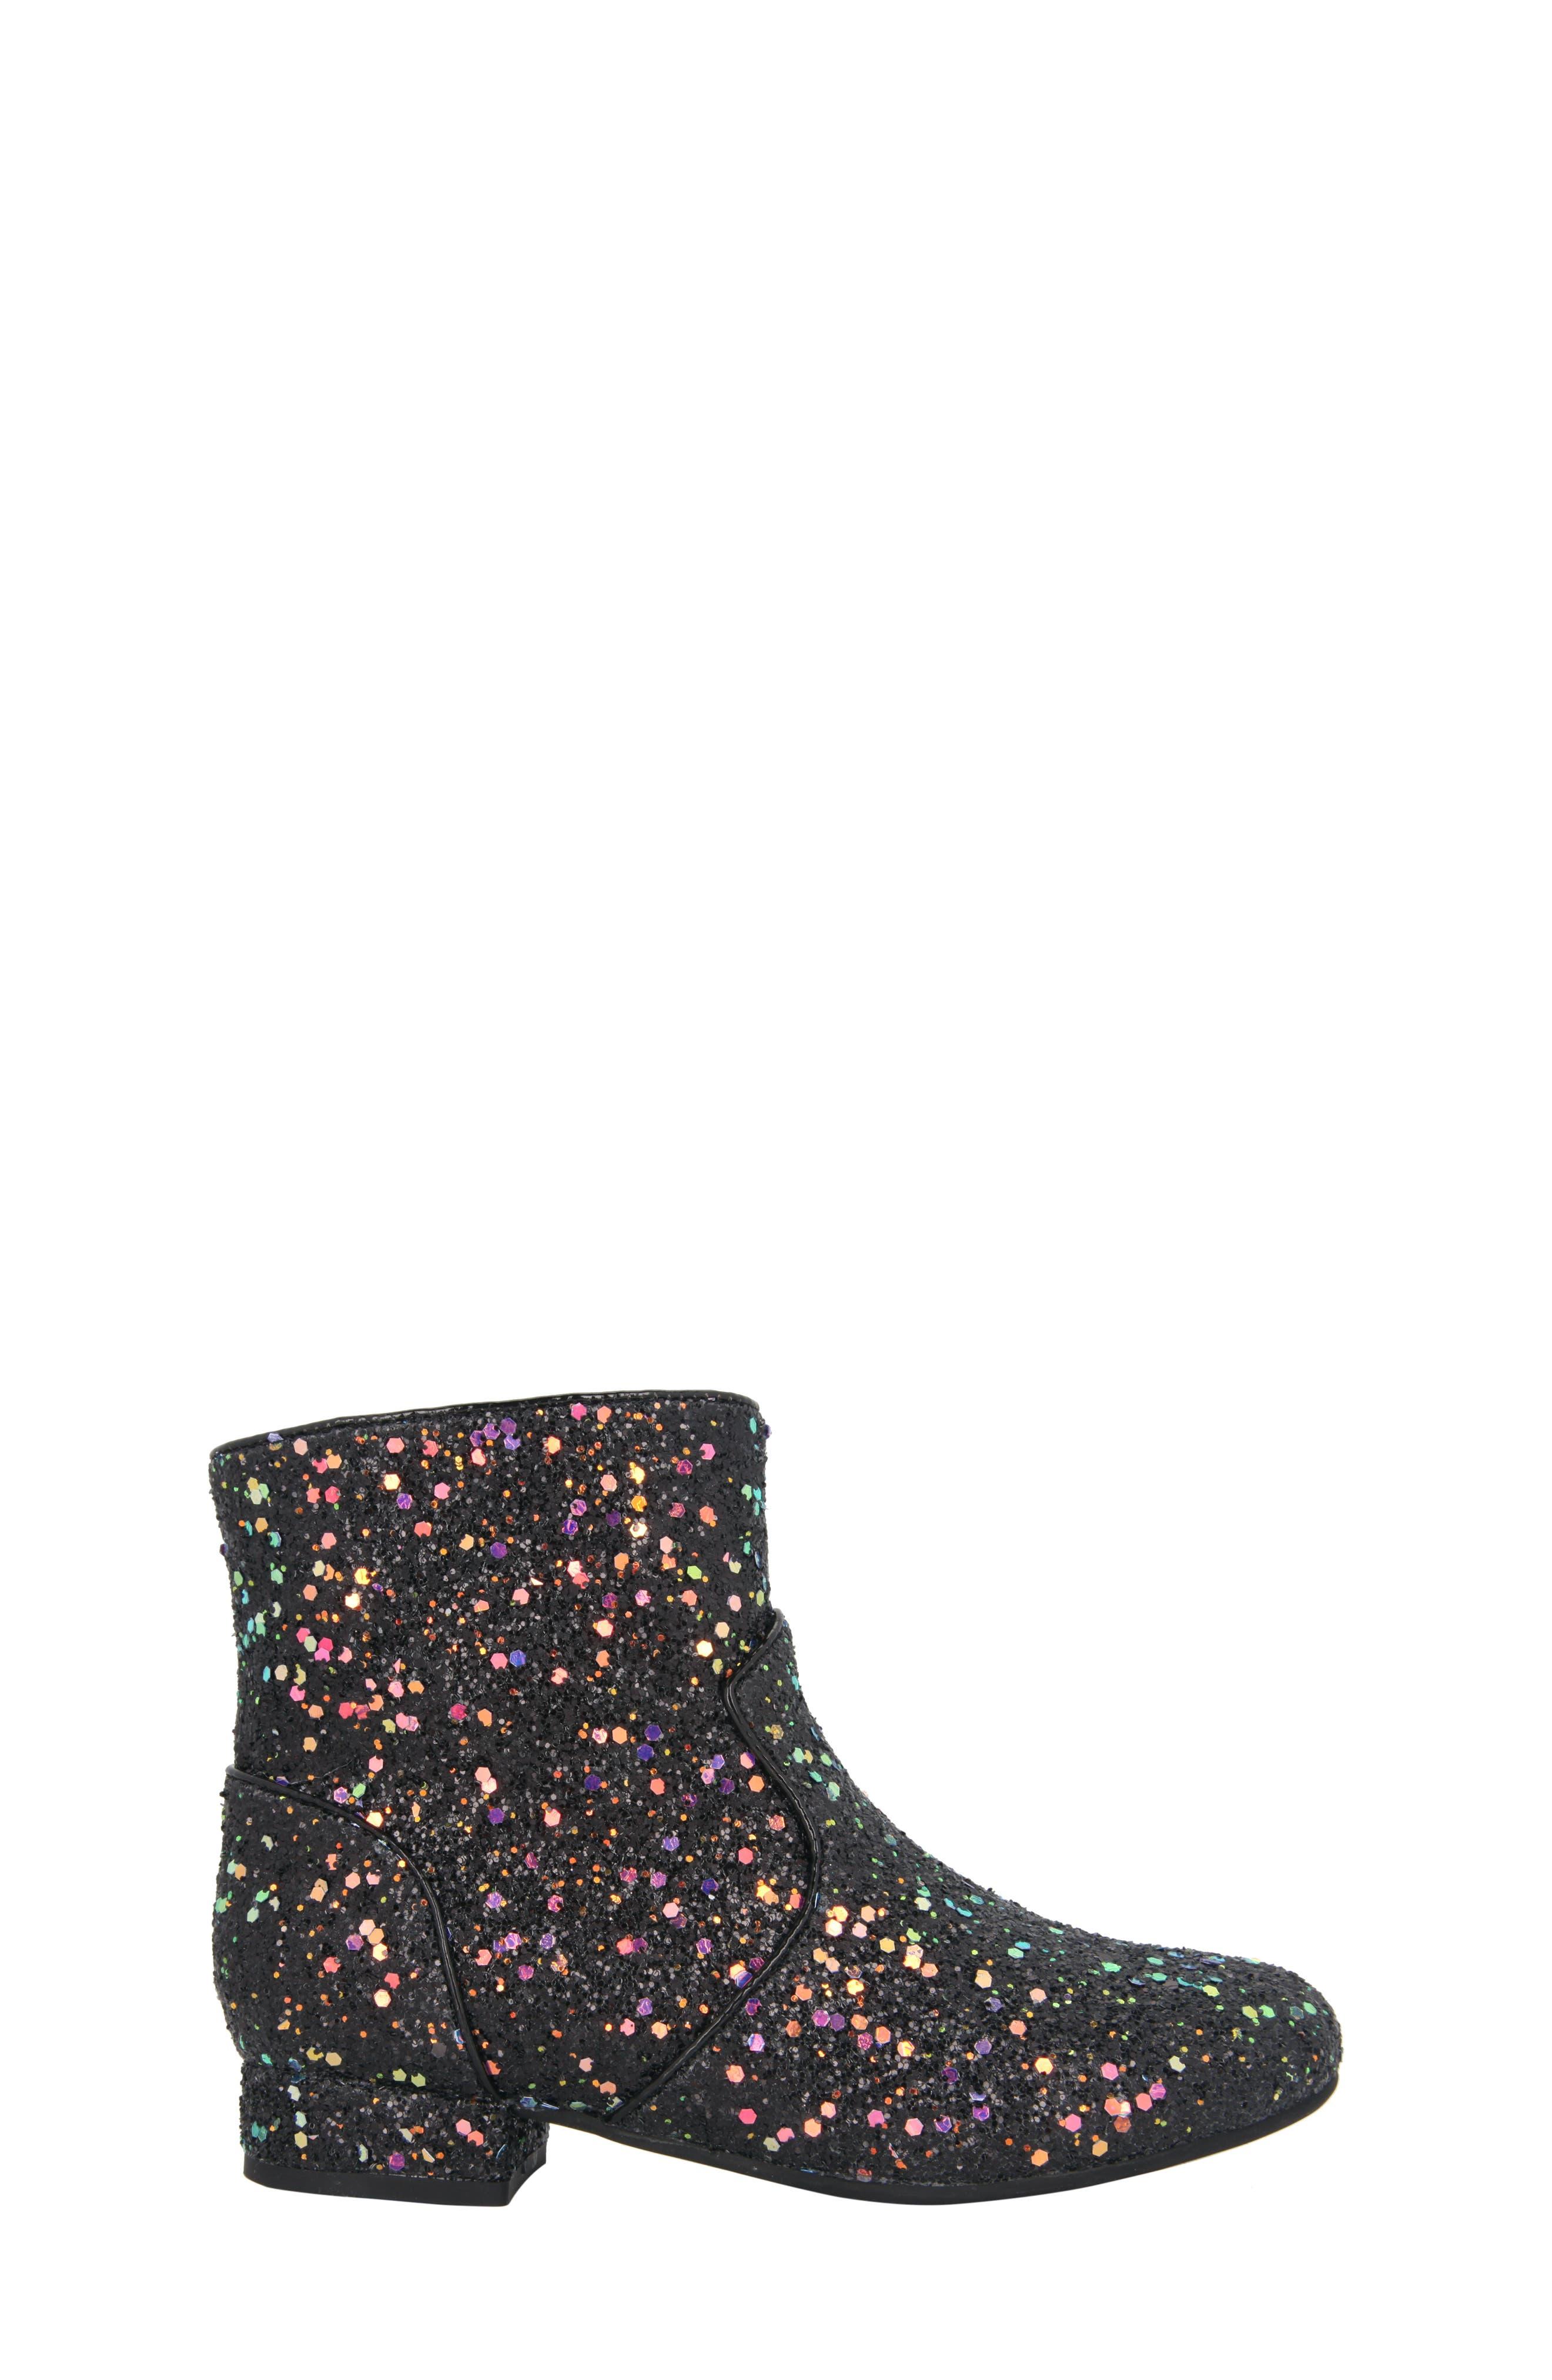 Amy Multicolor Glitter Bootie,                             Alternate thumbnail 3, color,                             Black Chunky Glitter